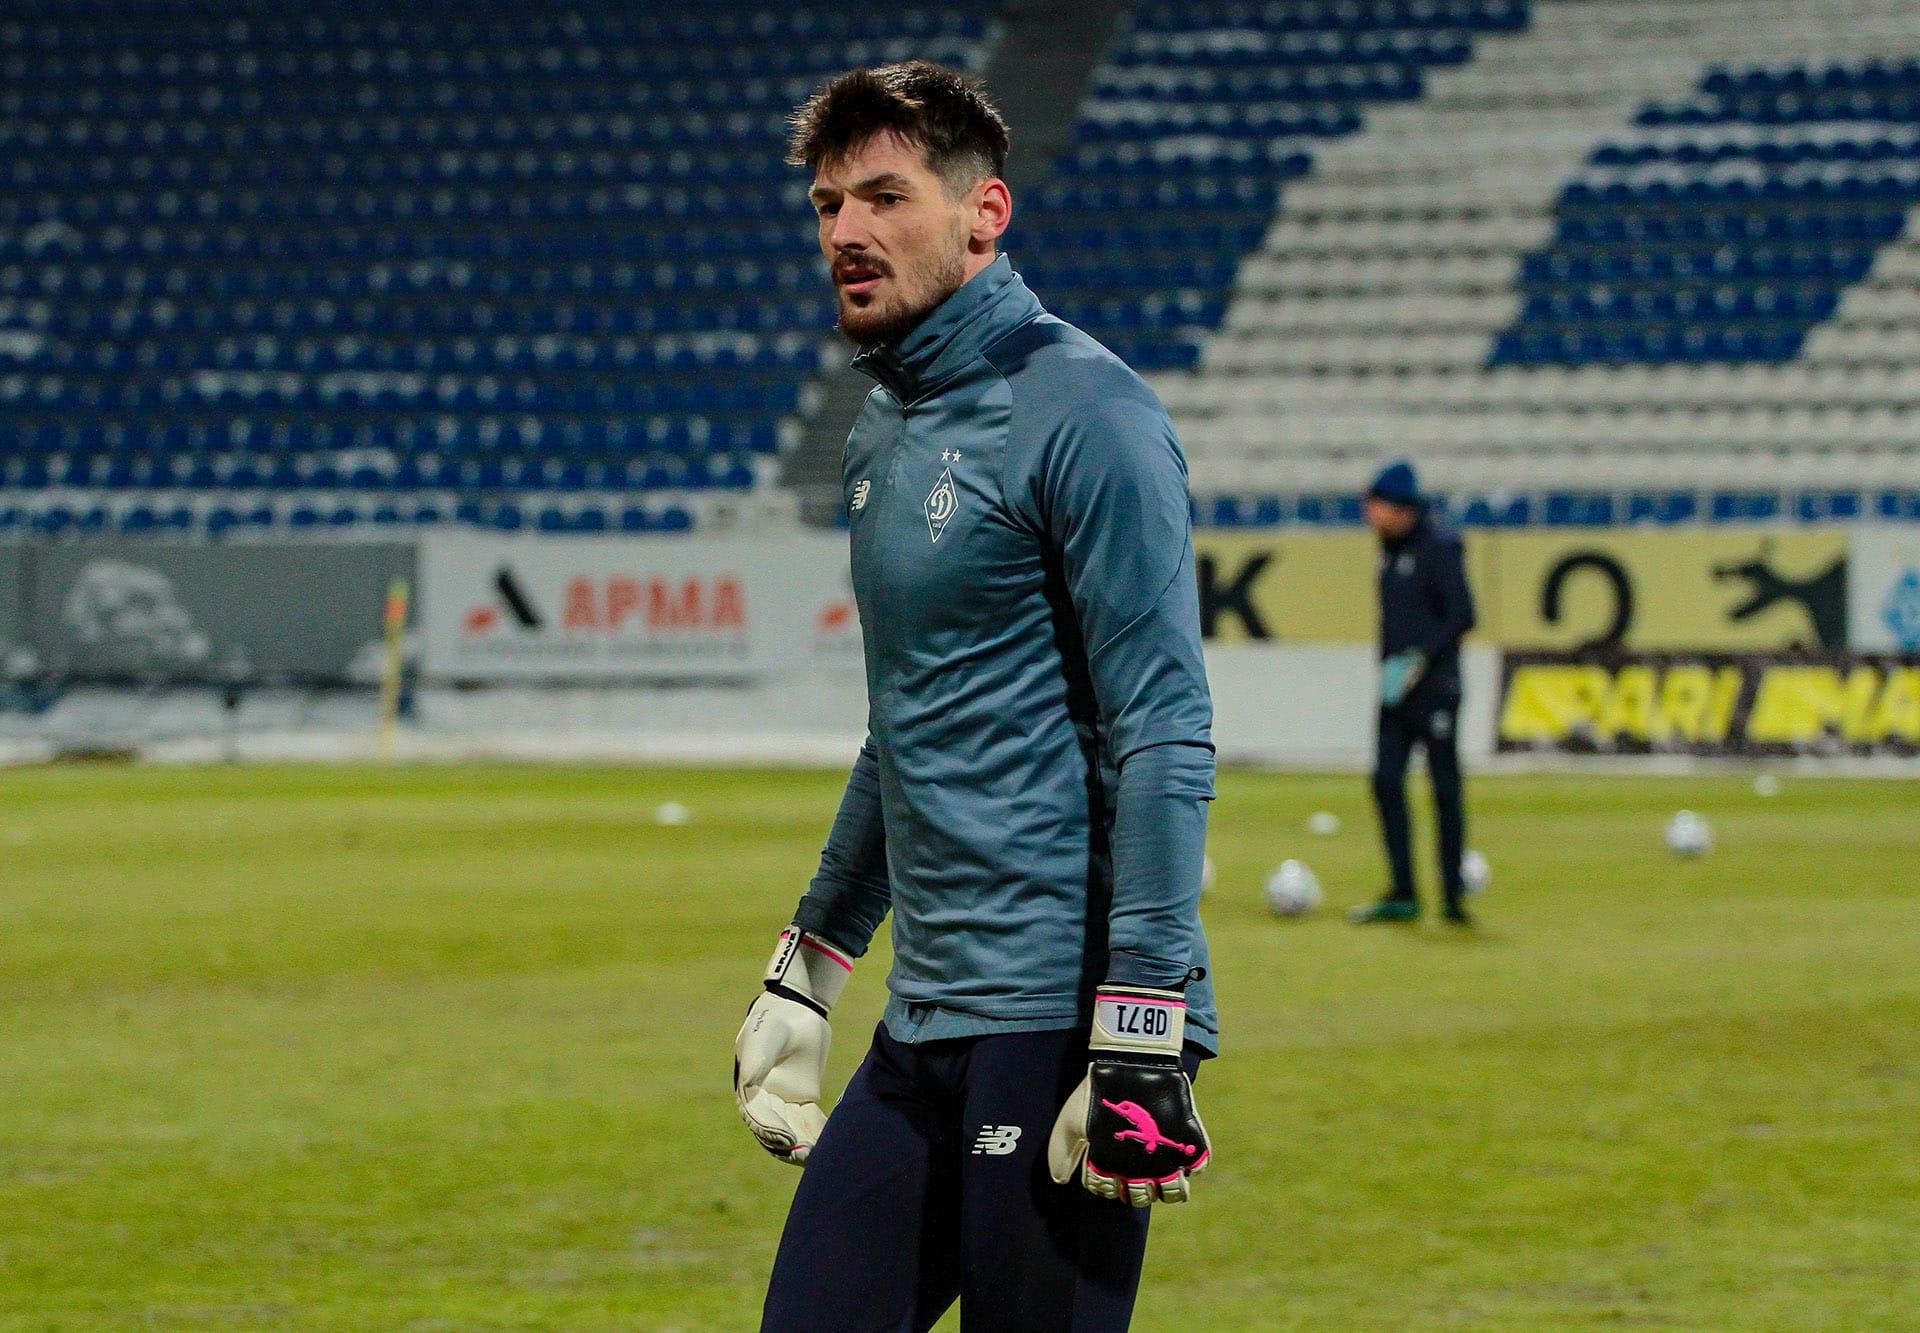 Brave GK Phantome Pink — choice of Denis Boyko